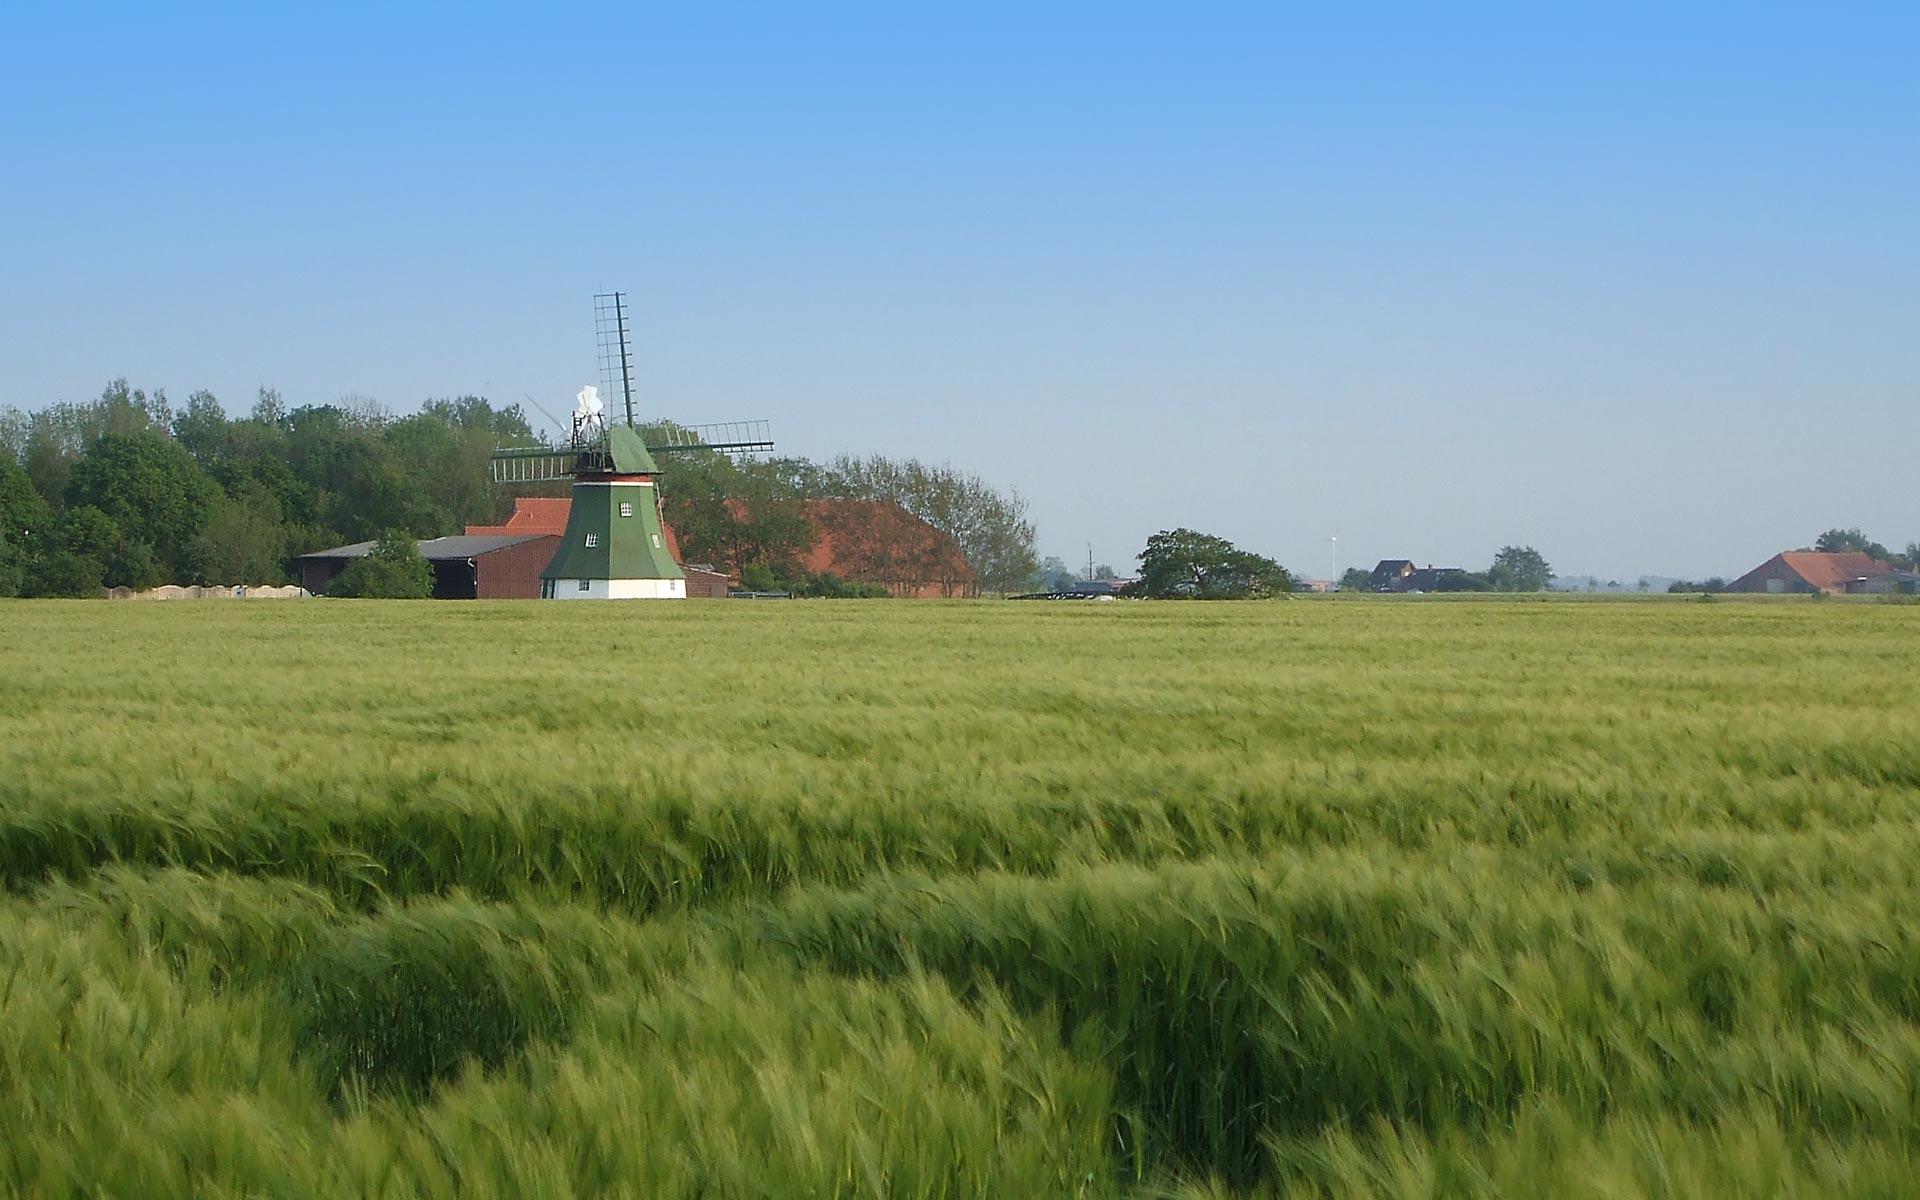 Fahrradwege Ostfriesland Karte.Fahrrad Fahren In Ostfriesland Die Funnixer Siele In Ostfriesland